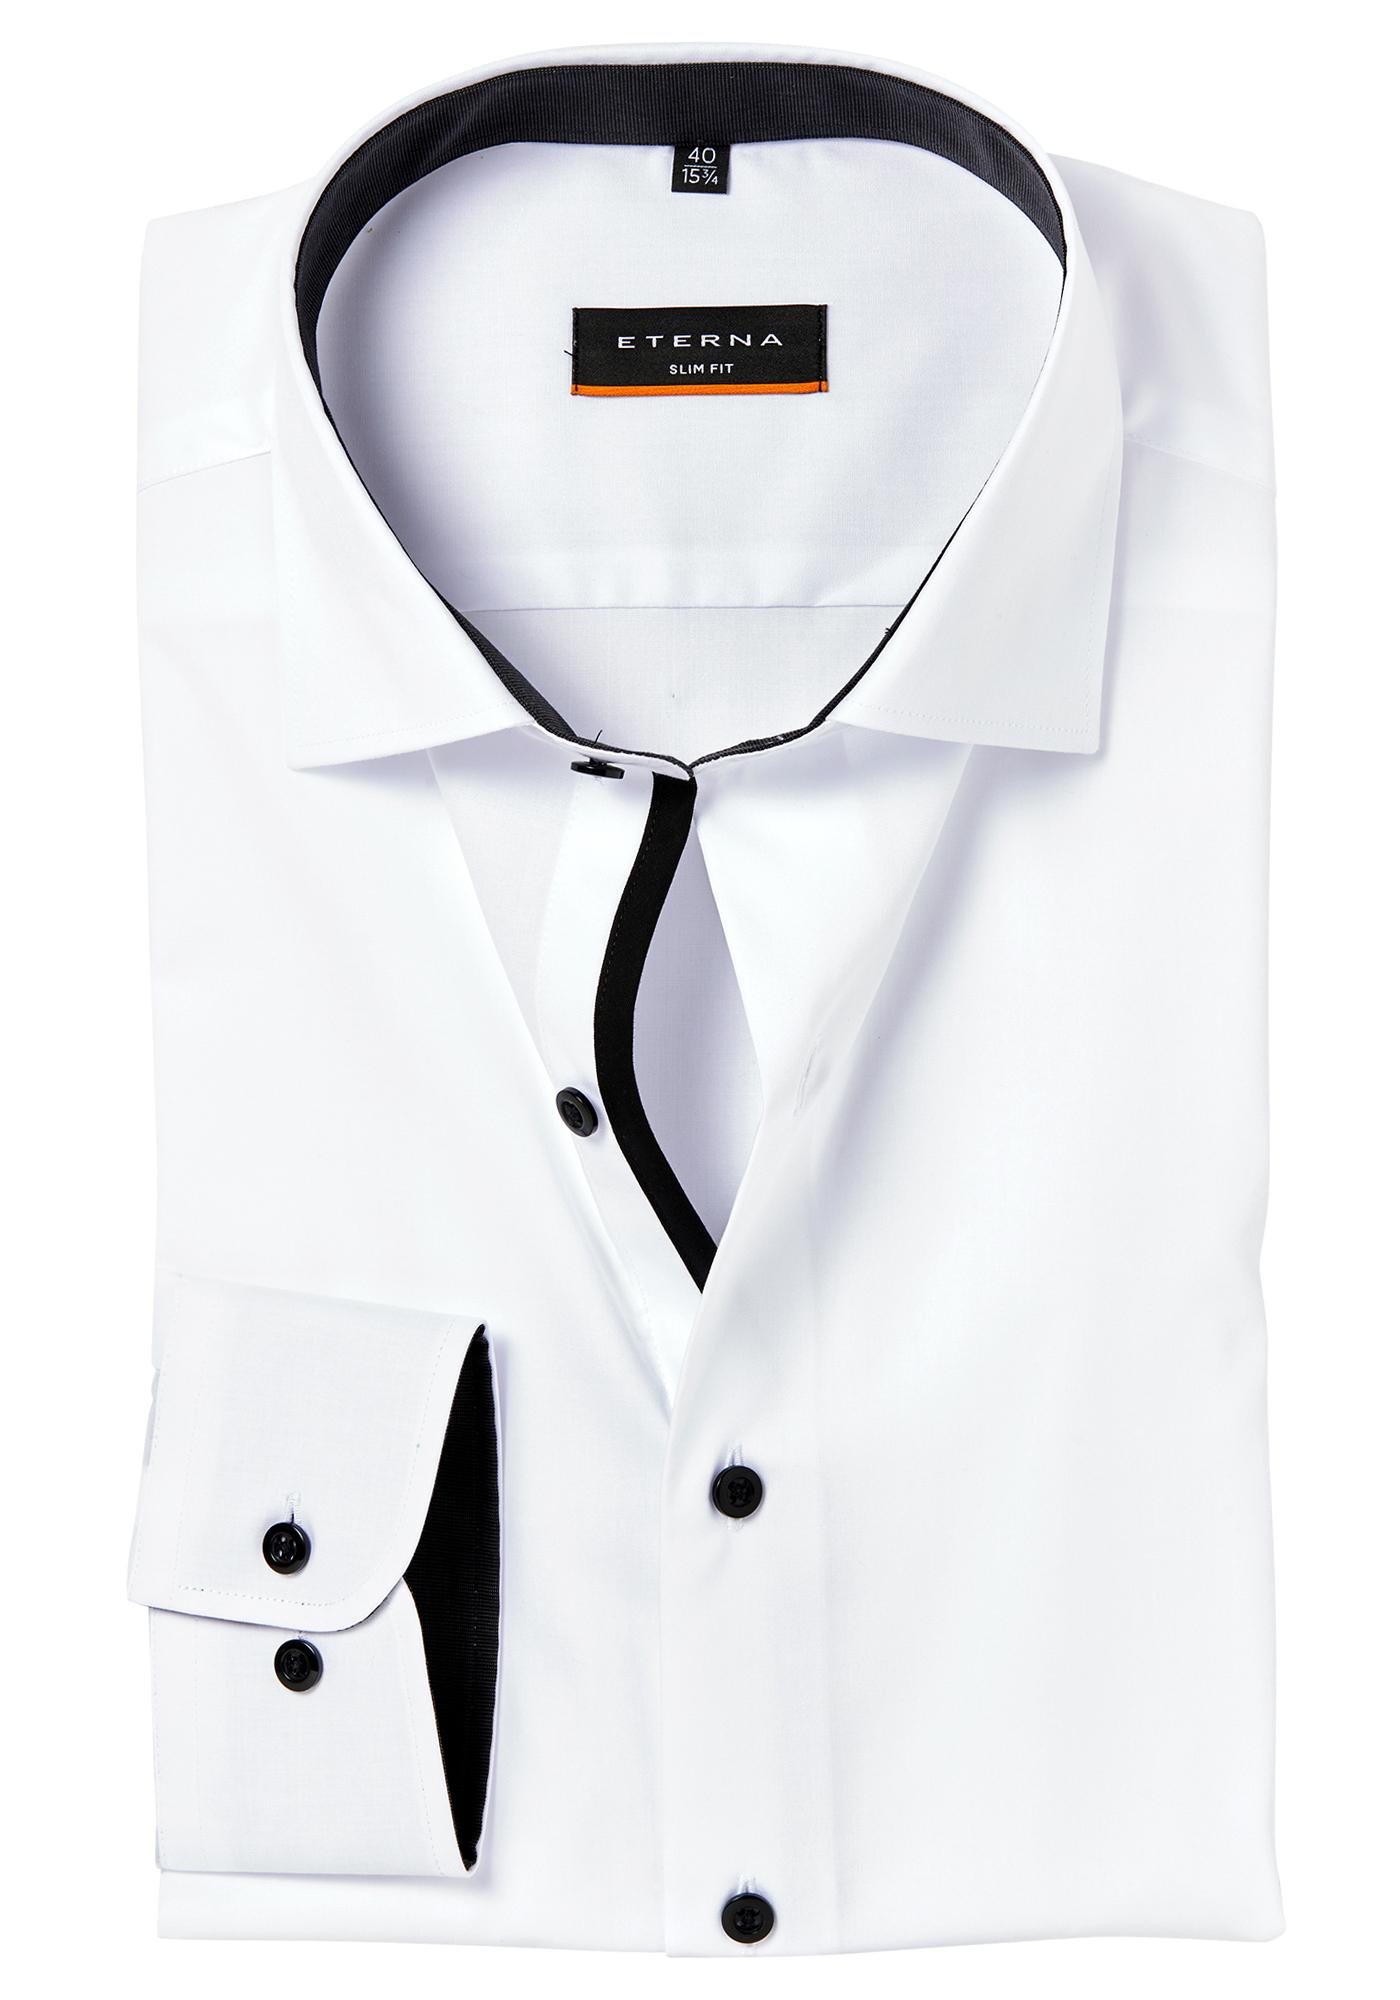 Overhemd Wit Slim Fit.Eterna Slim Fit Stretch Overhemd Wit Zwart Contrast Vakantiedeals